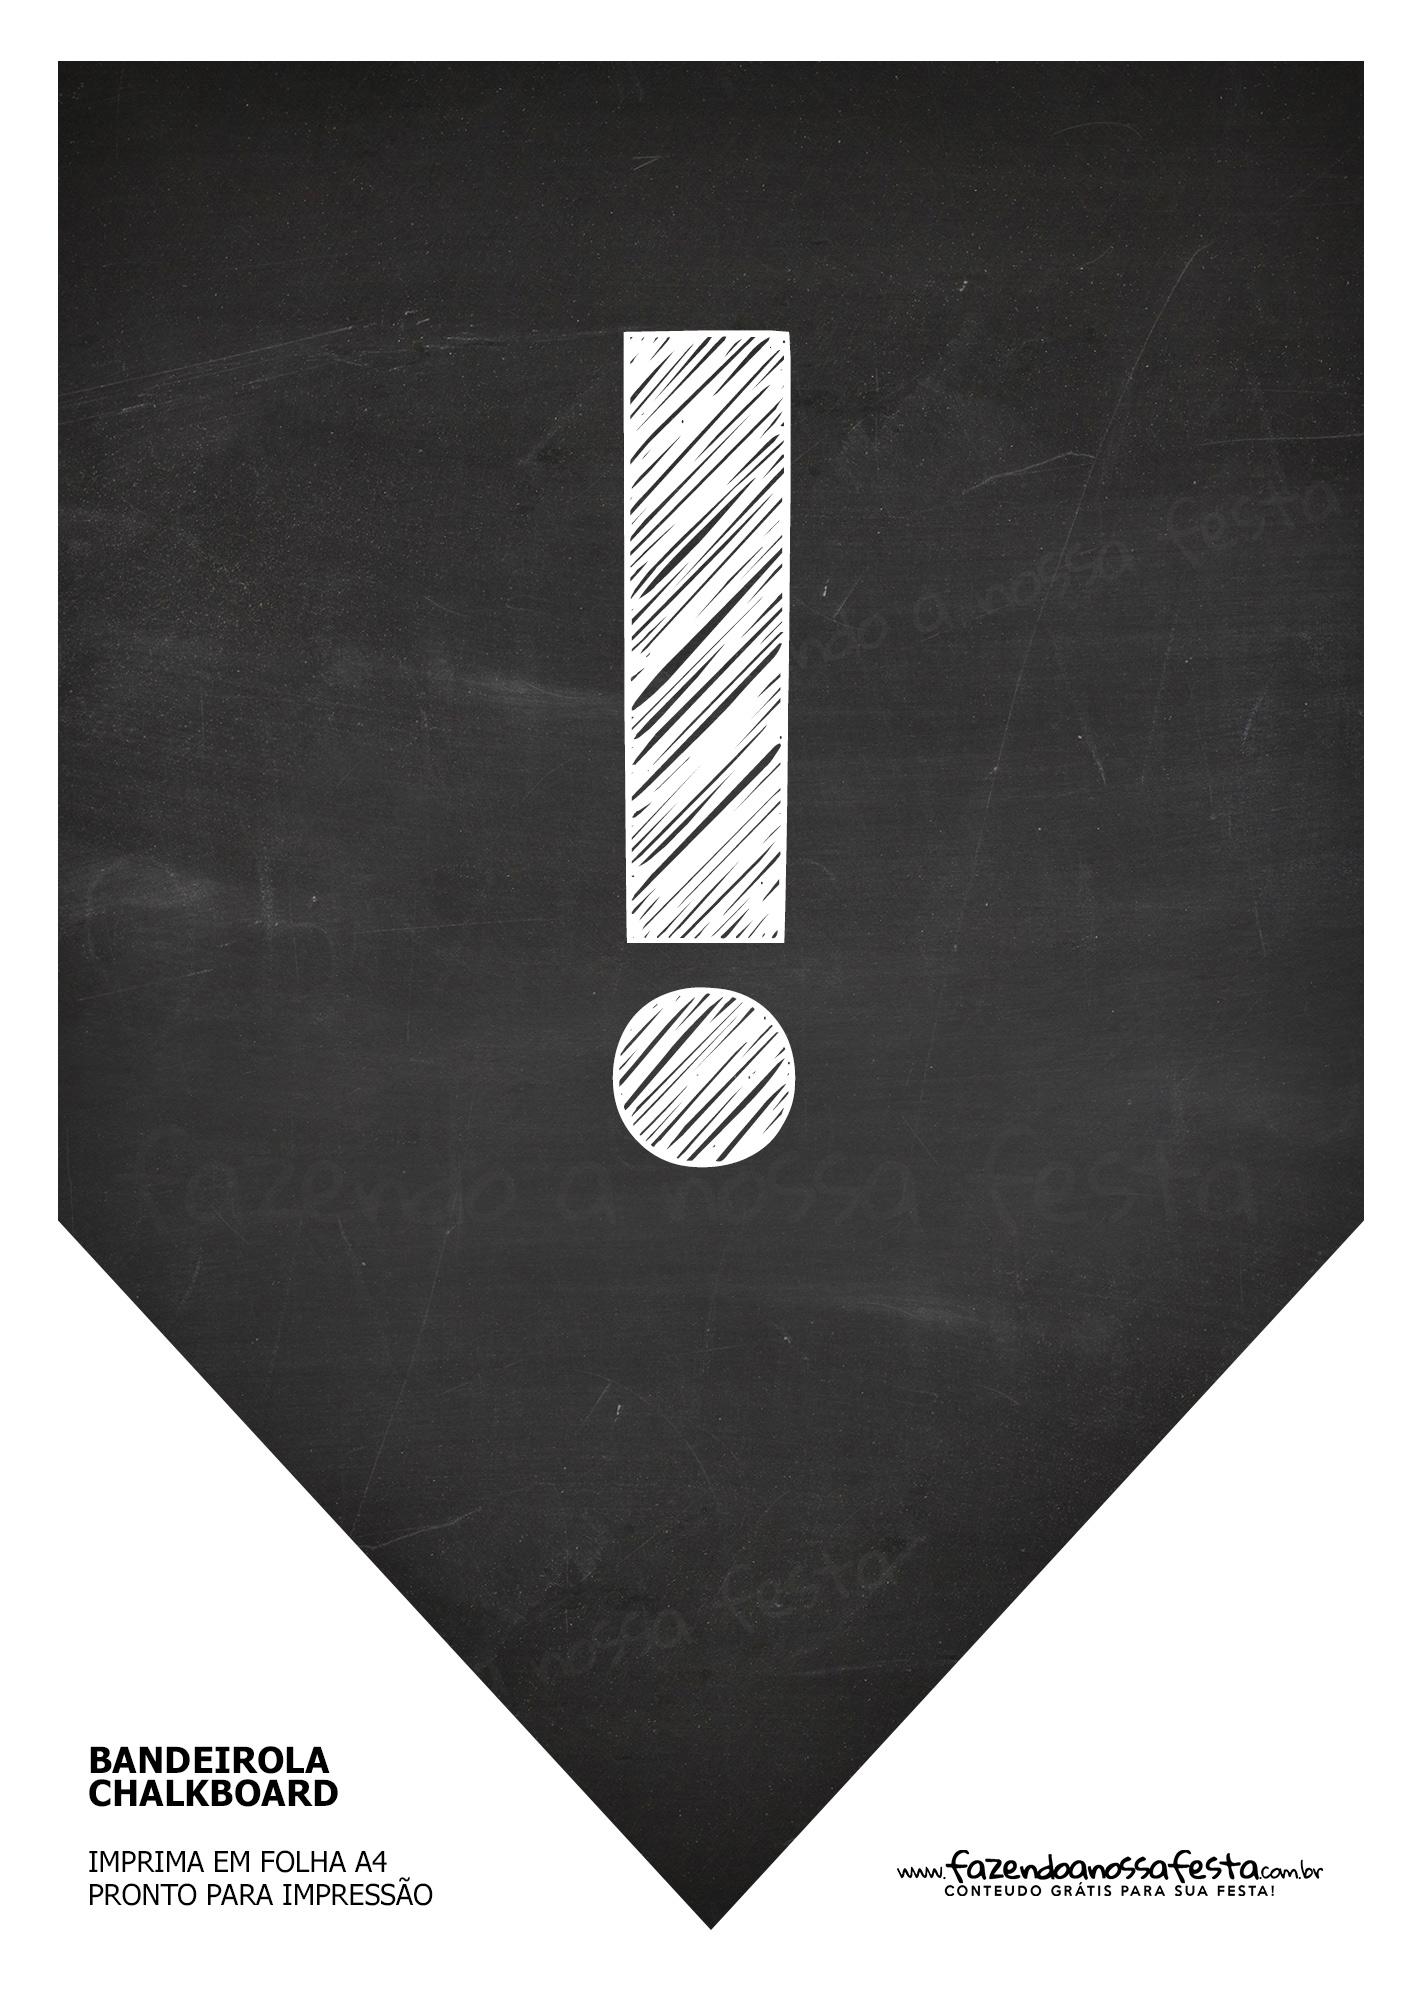 Bandeirinha Chalkboard !